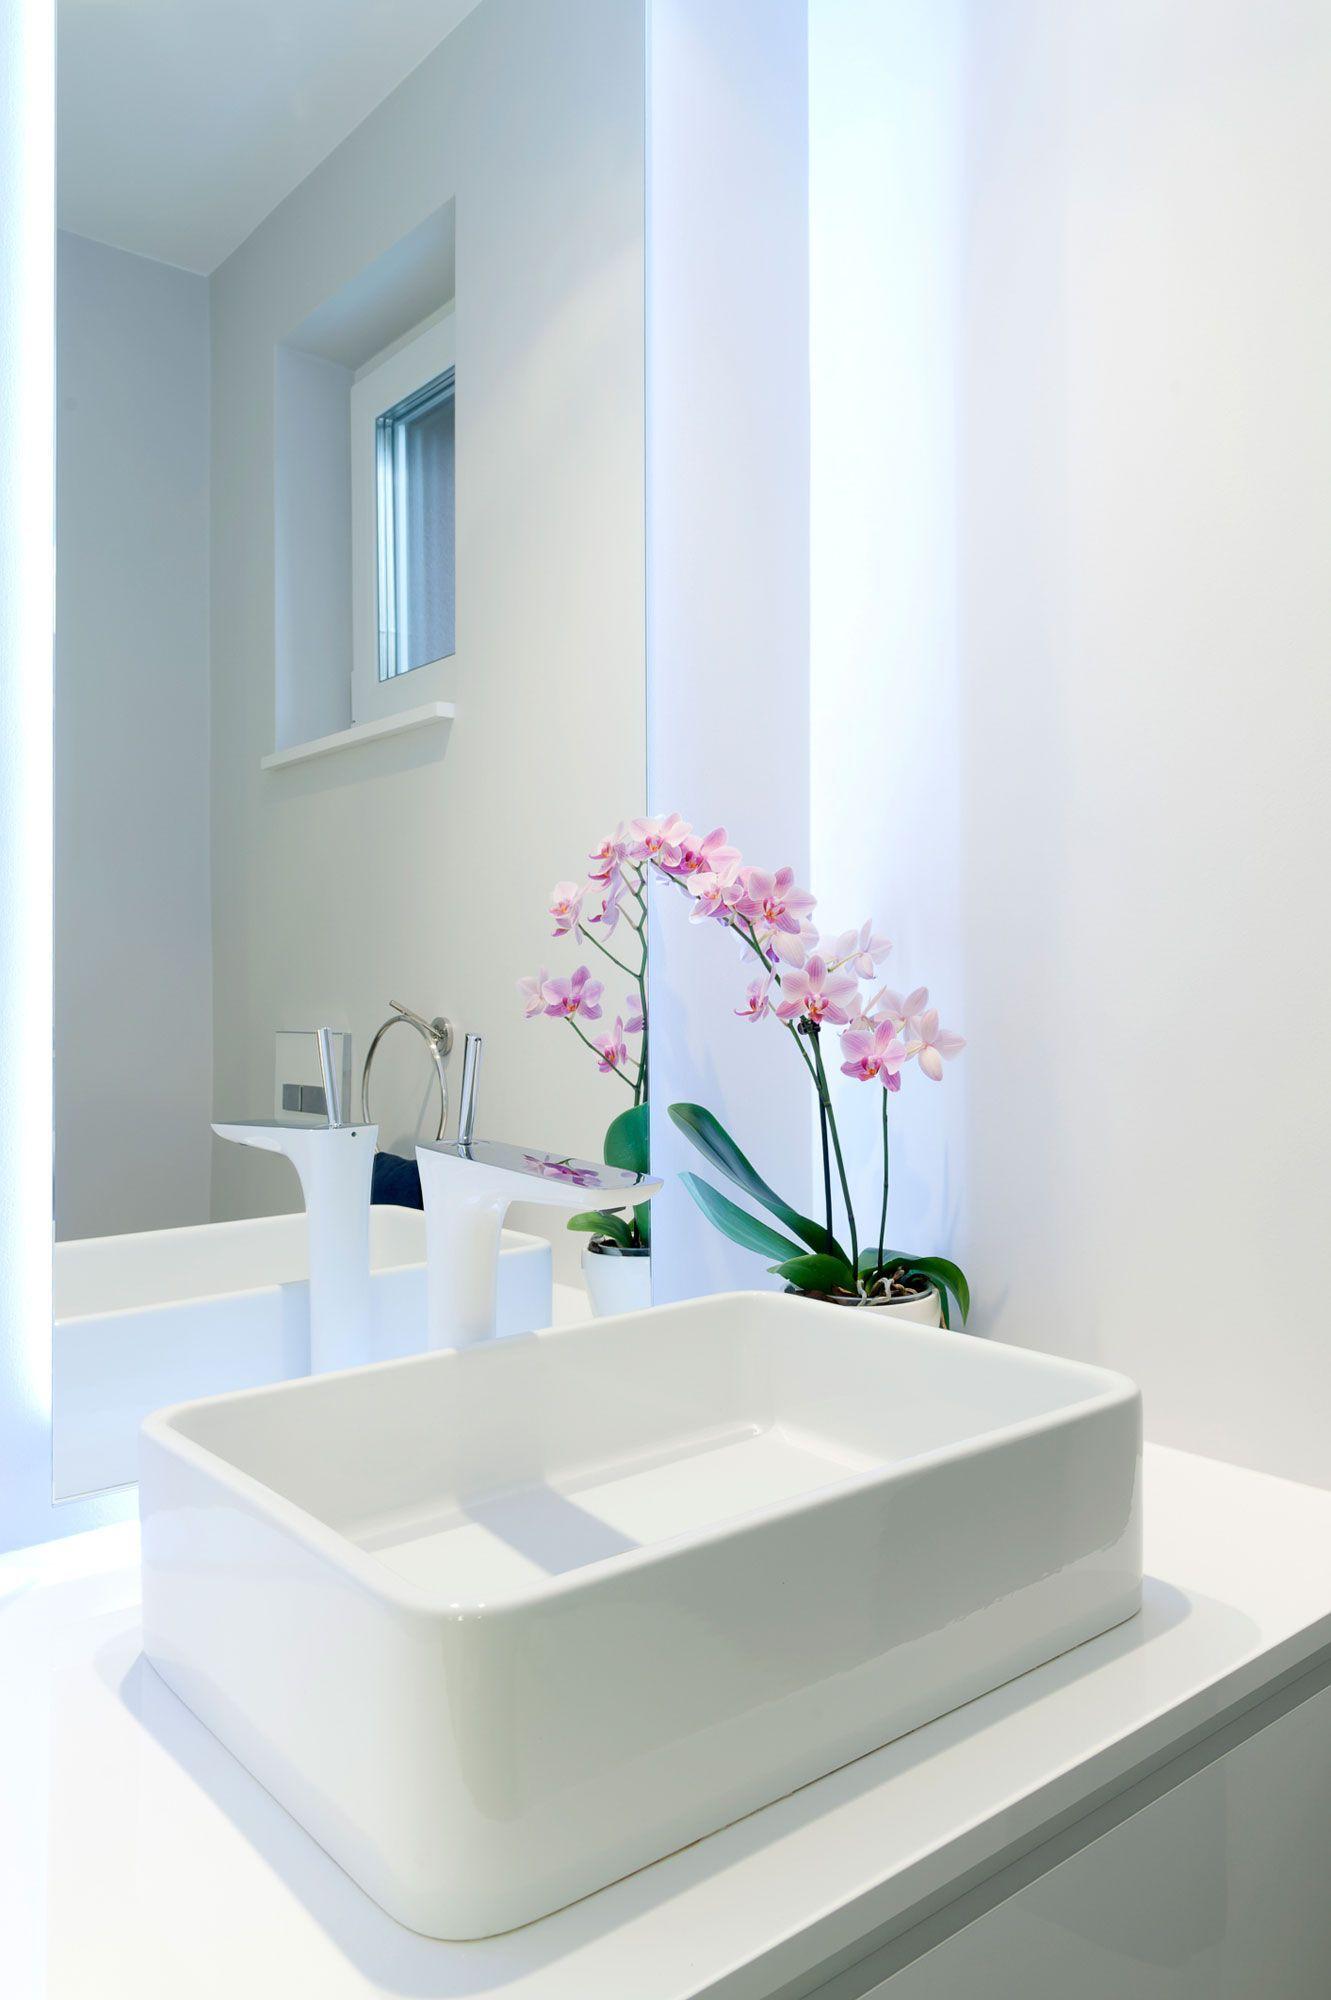 Ideas para decorar un baño pequeño | Baño pequeño, Ideas para ...